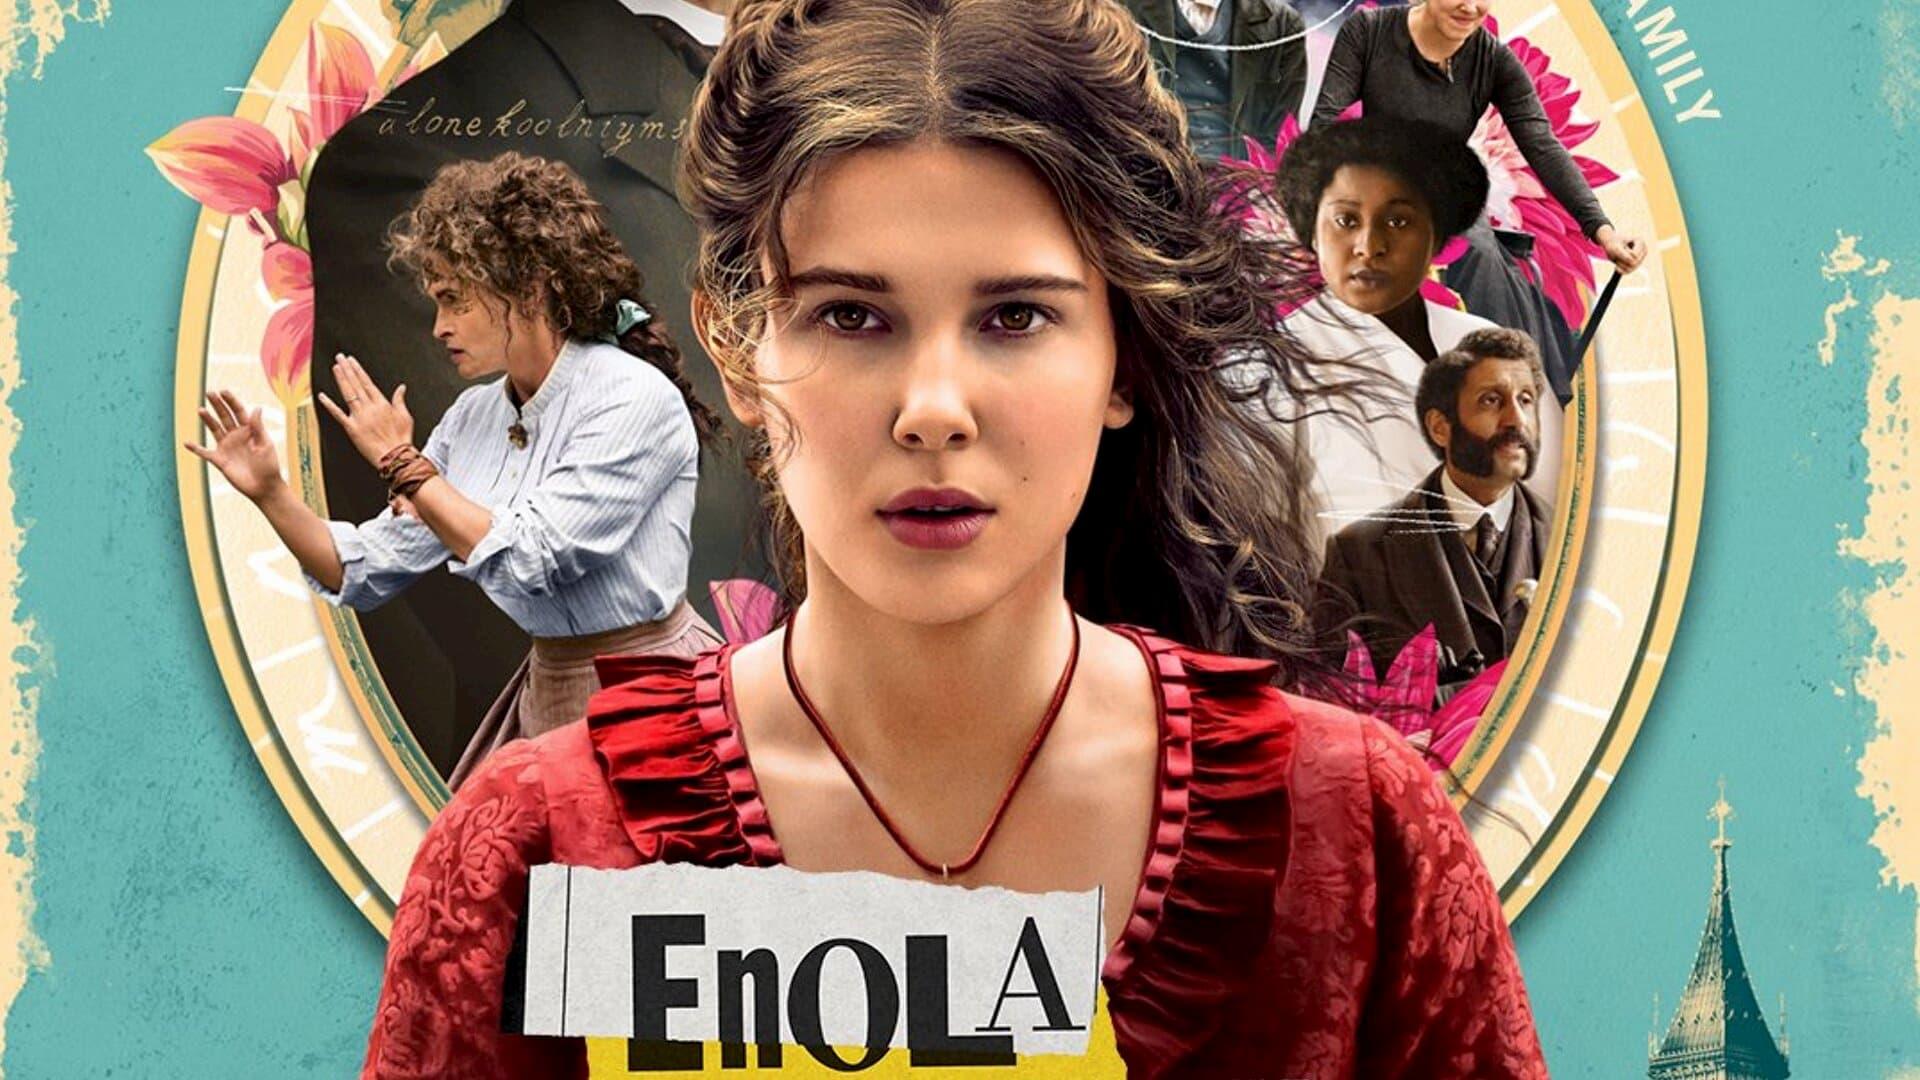 Enola Holmes: trama, cast, trailer, data uscita su Netflix